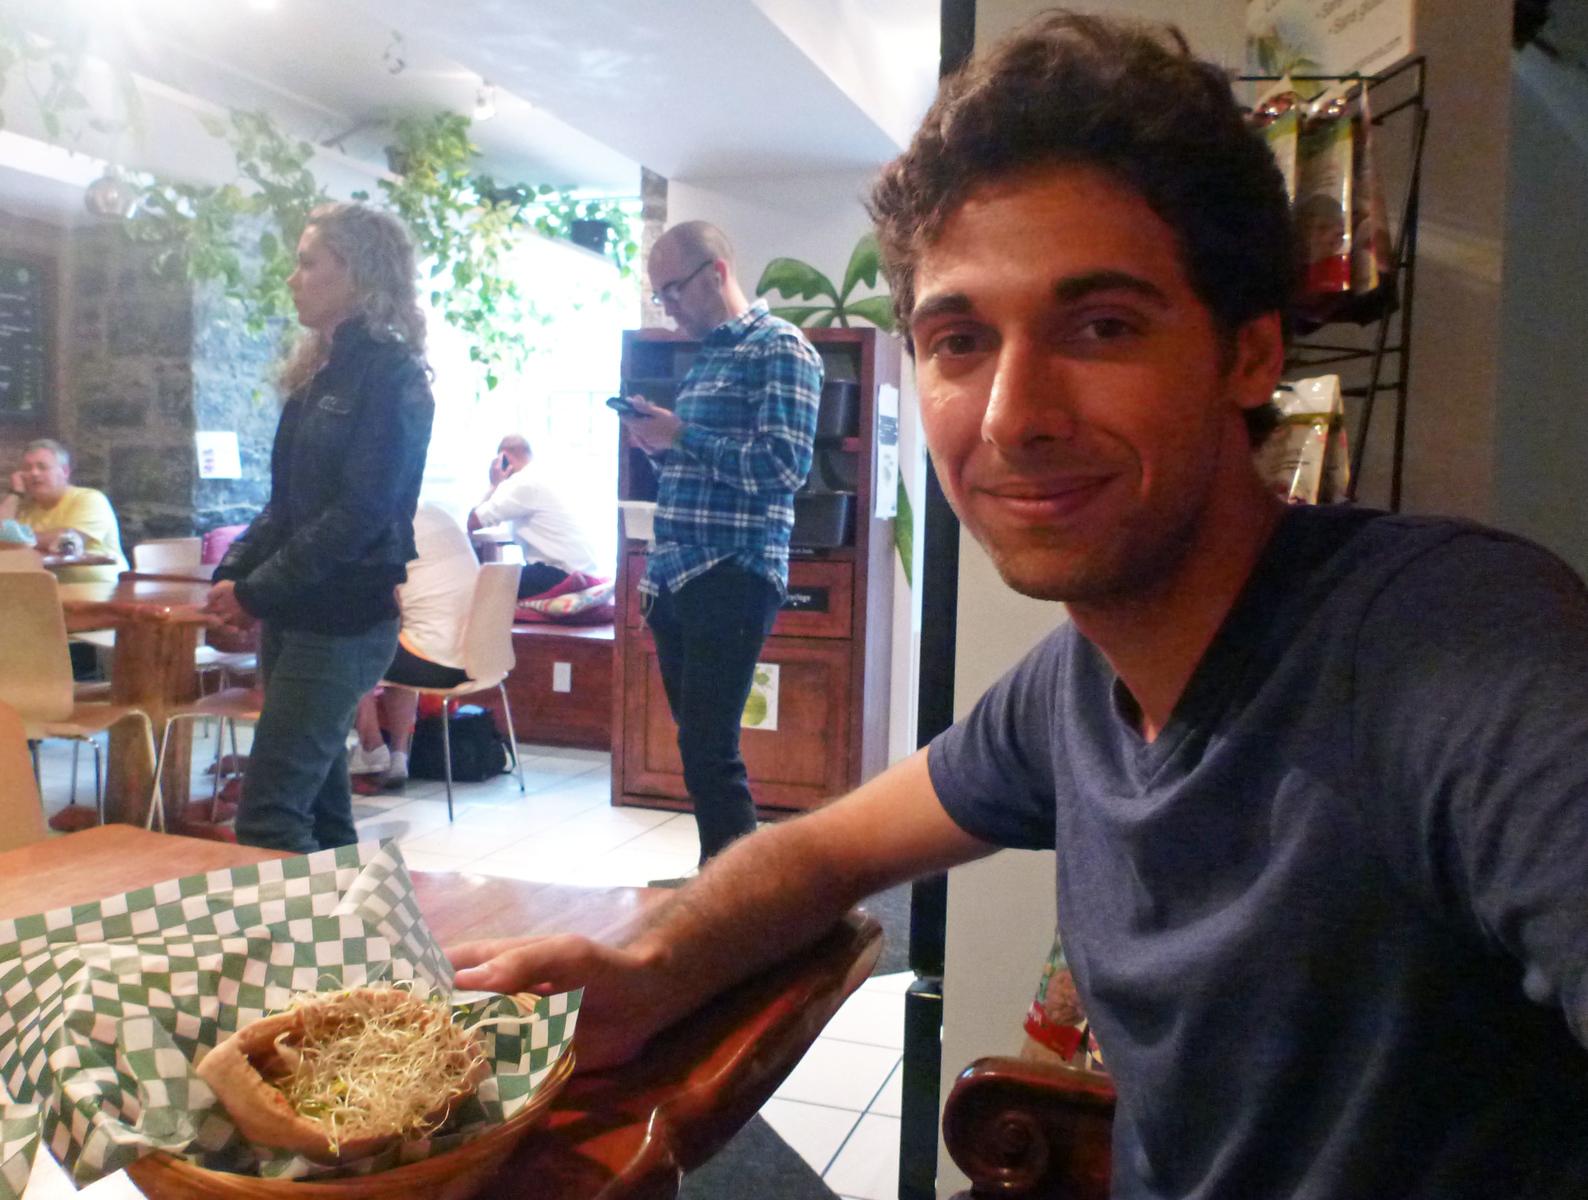 La Panthere Verte - The Best Falafel in Montreal - Vegan Restaurant - Montreal, Canada